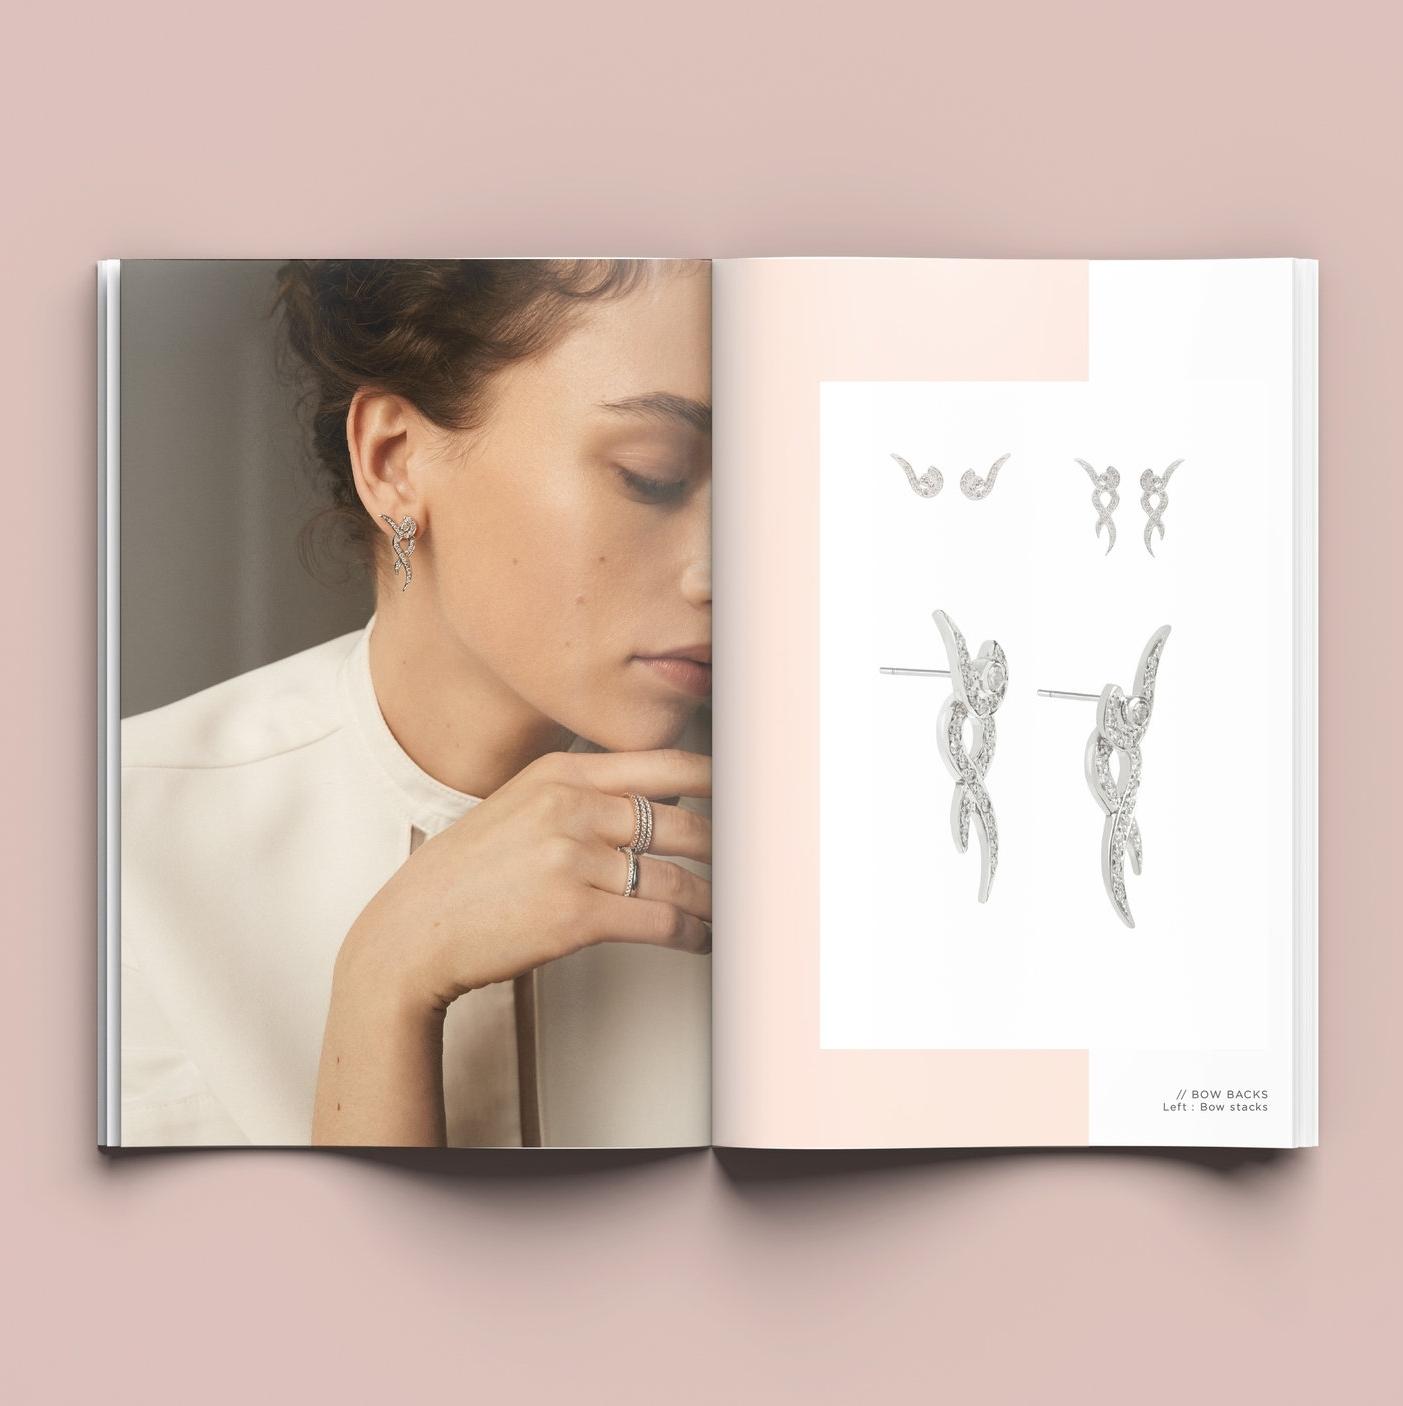 Bolter design look book design for Emma Clarkson Webb